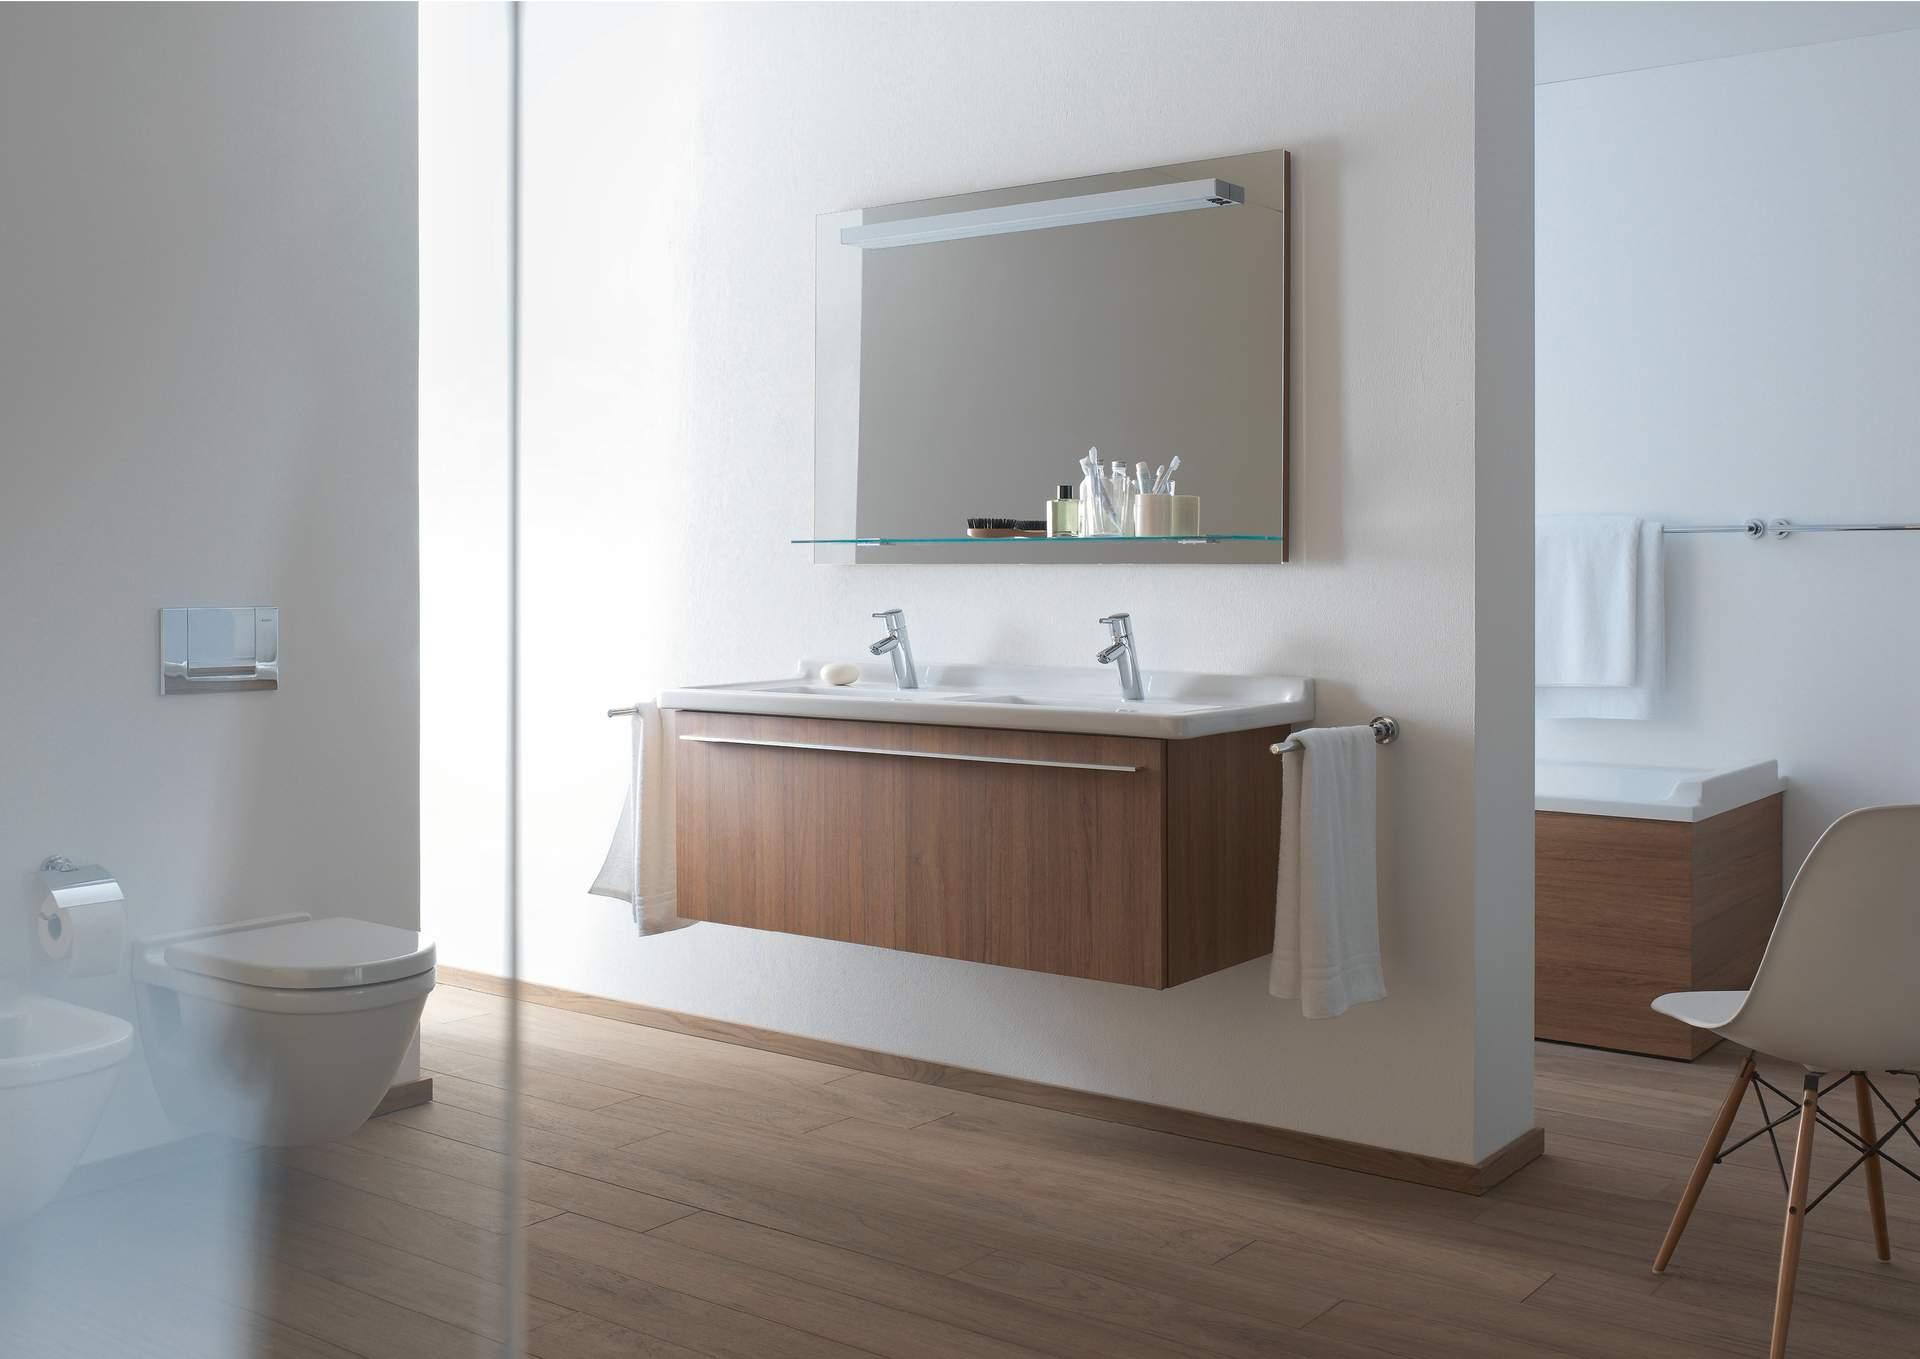 Image Result For Bathroom Sink And Vanity Unit